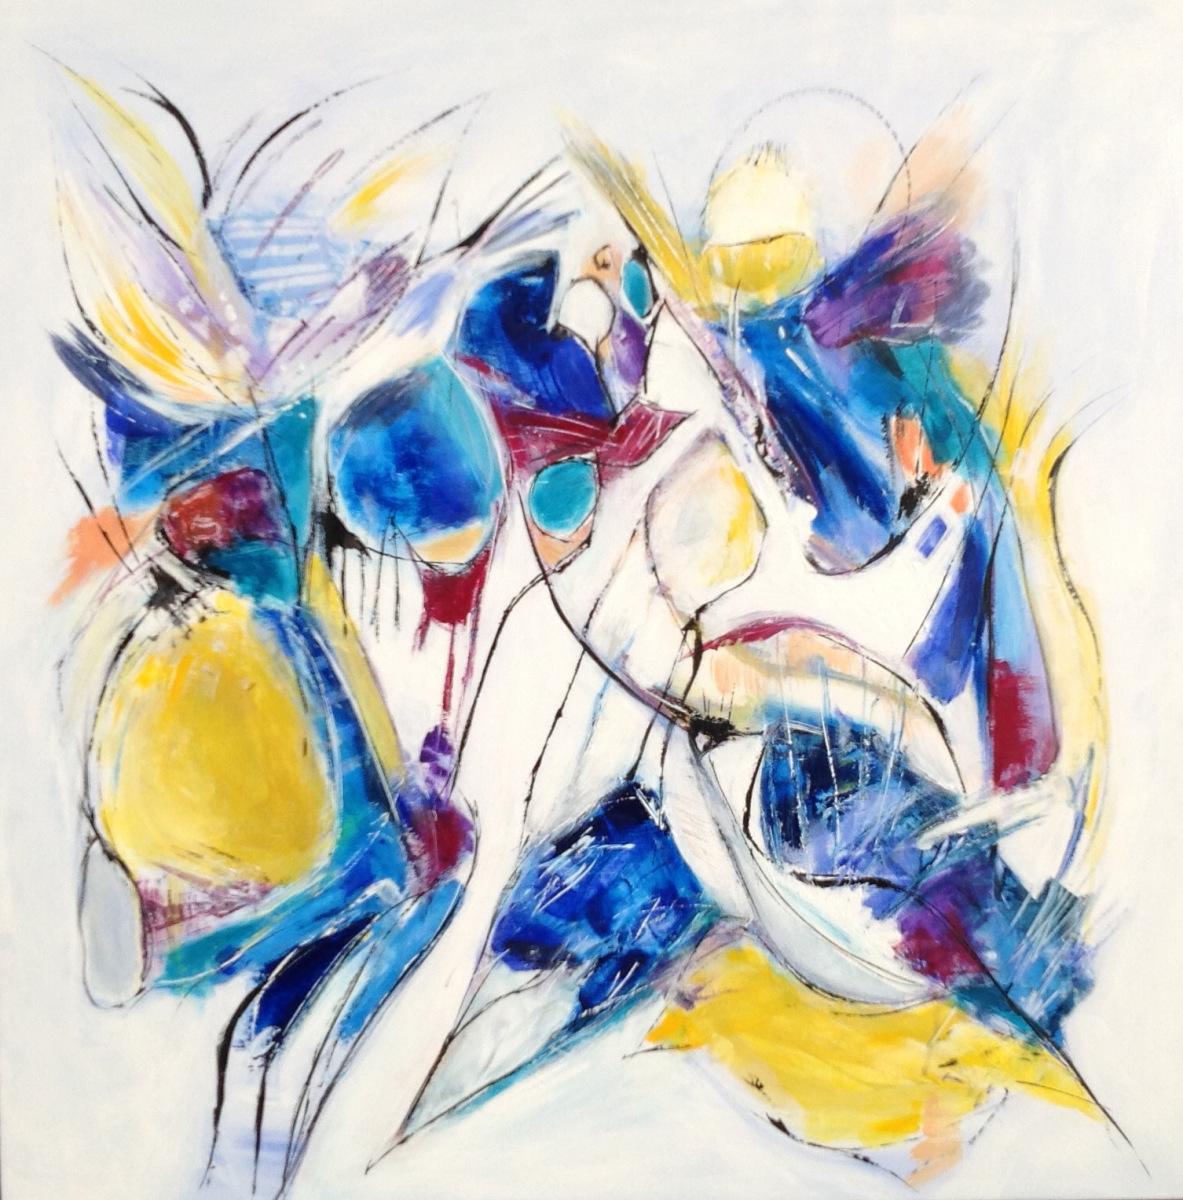 Abstrakt 80 x 80 cm  gave til I